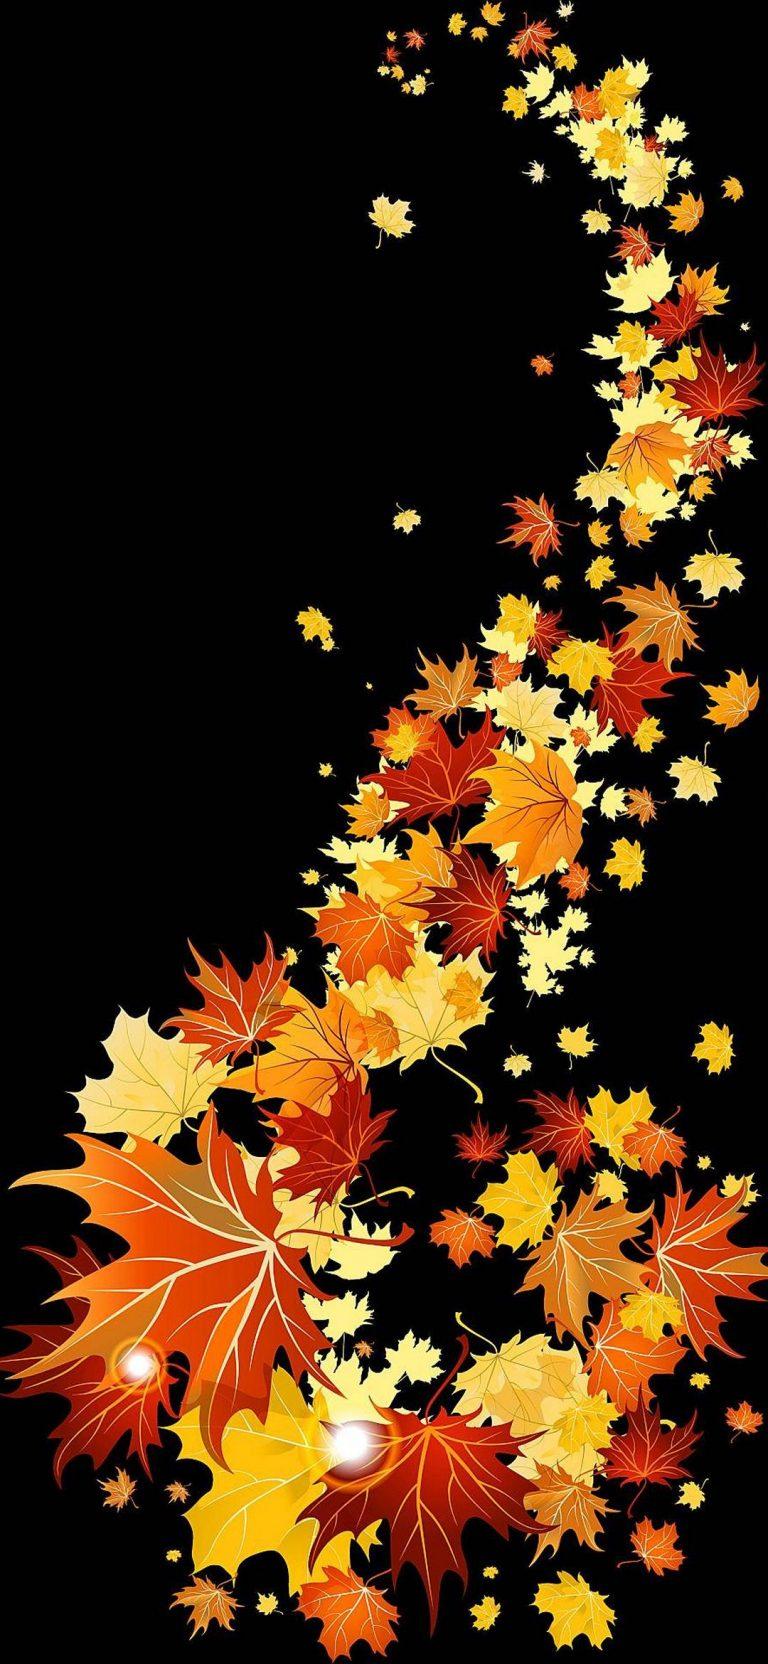 Autumn Phone Wallpaper 057 768x1664